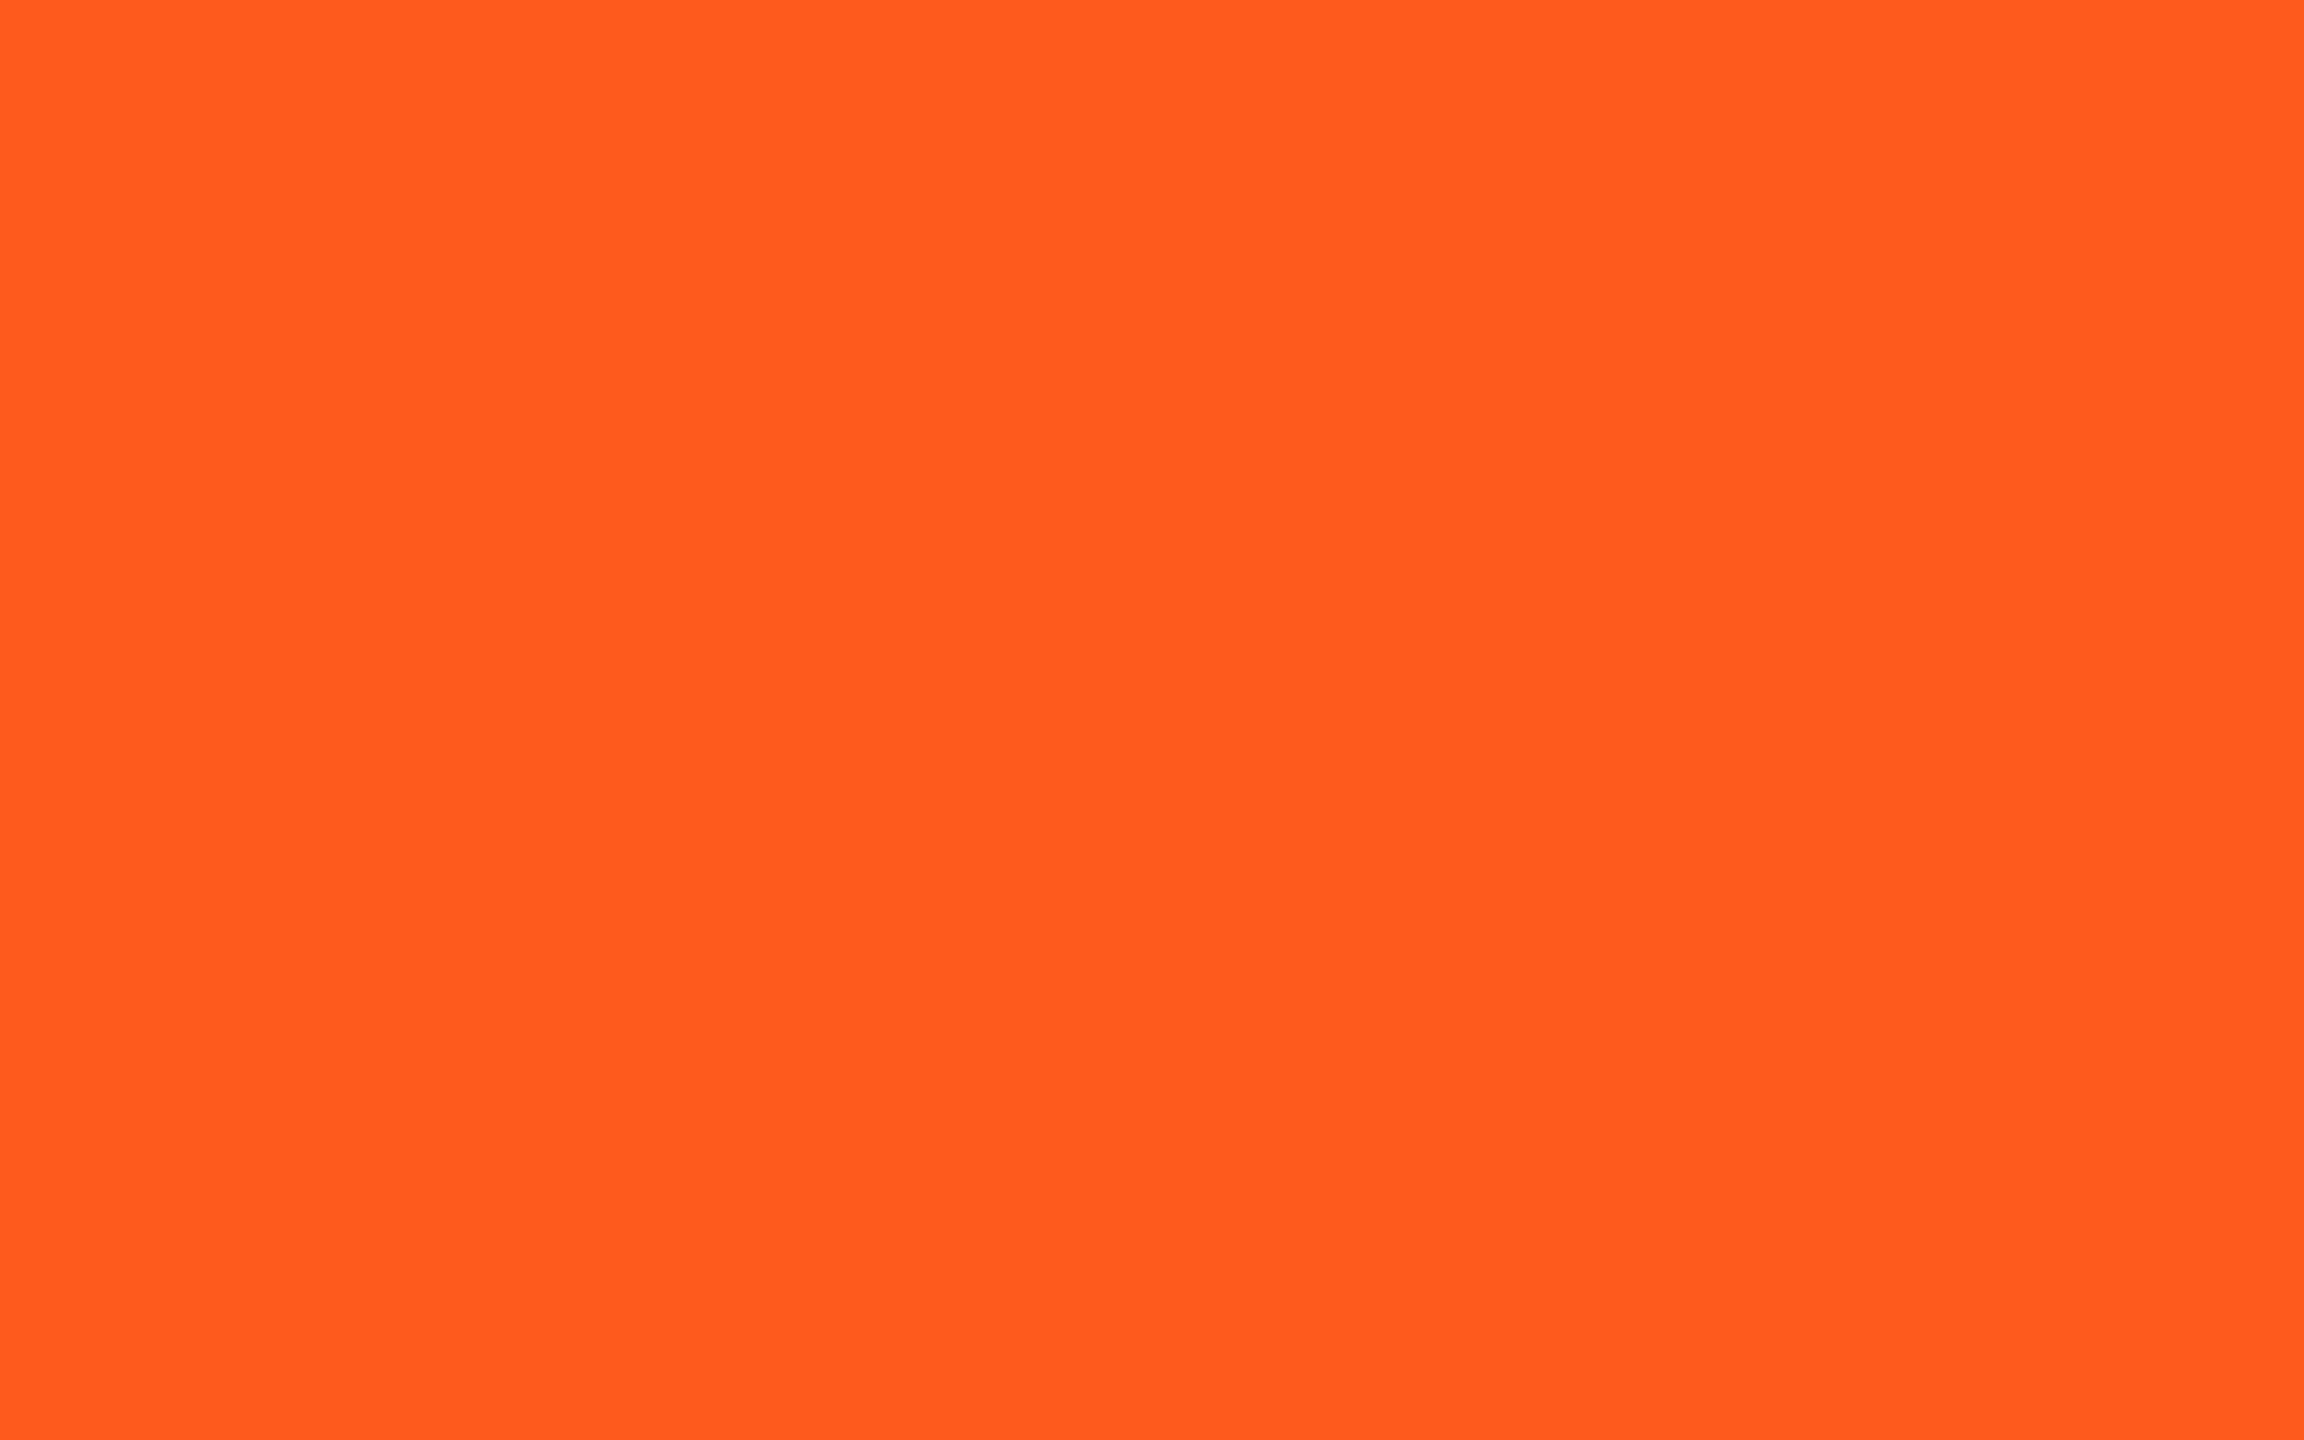 2304x1440 Giants Orange Solid Color Background